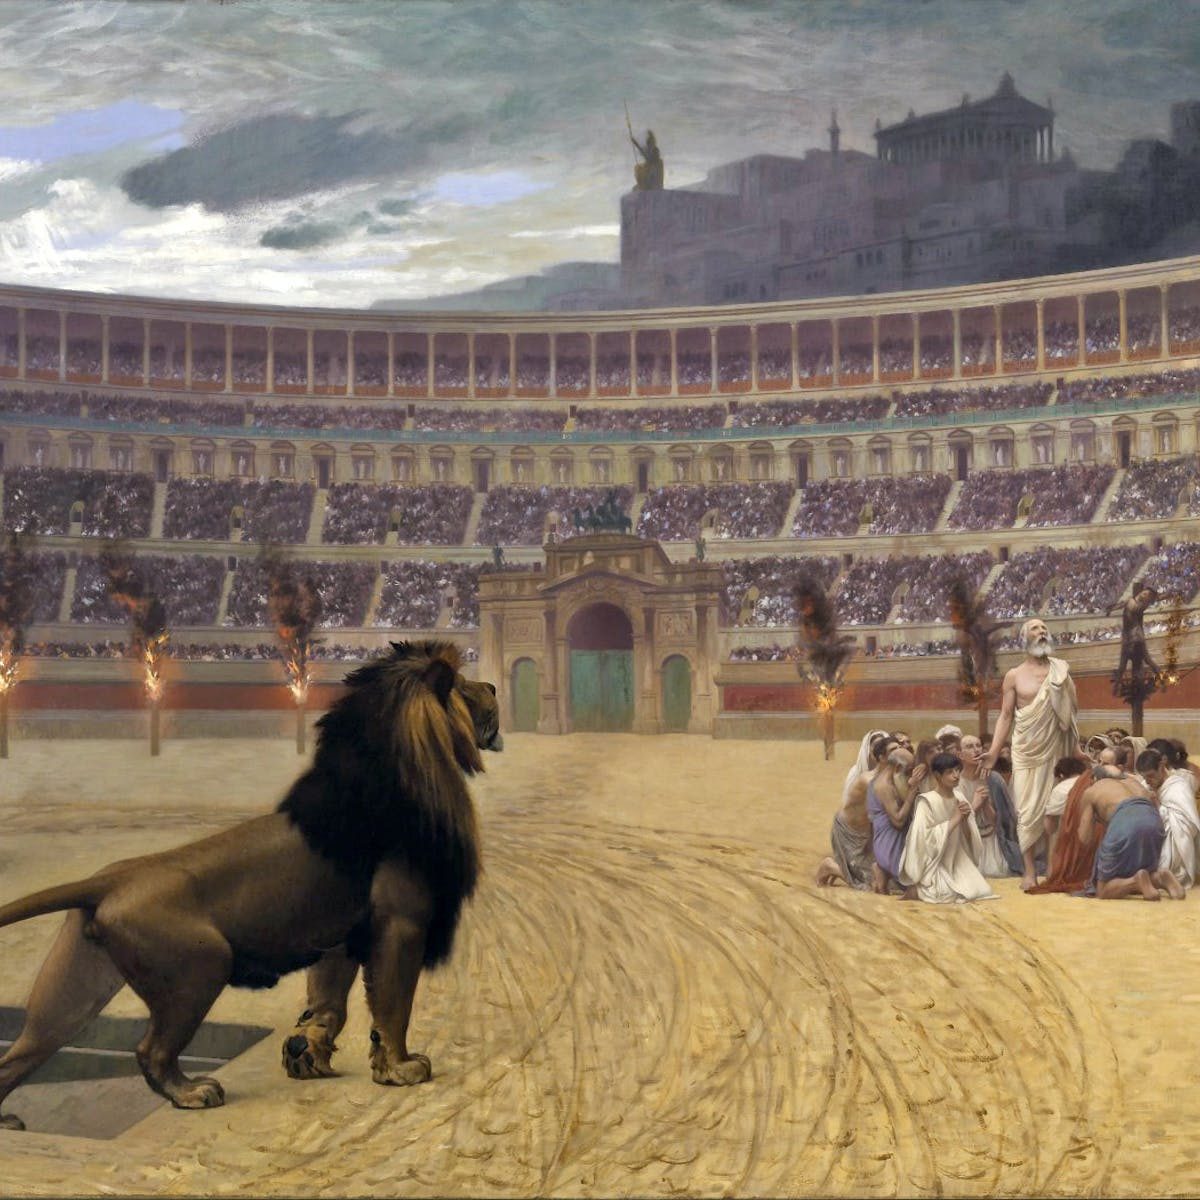 Gaius Julius Caesar vs Hades - Stránka 3 Image-20161026-11265-1pikoh7.jpg?ixlib=rb-1.1.0&q=45&auto=format&w=1200&h=1200